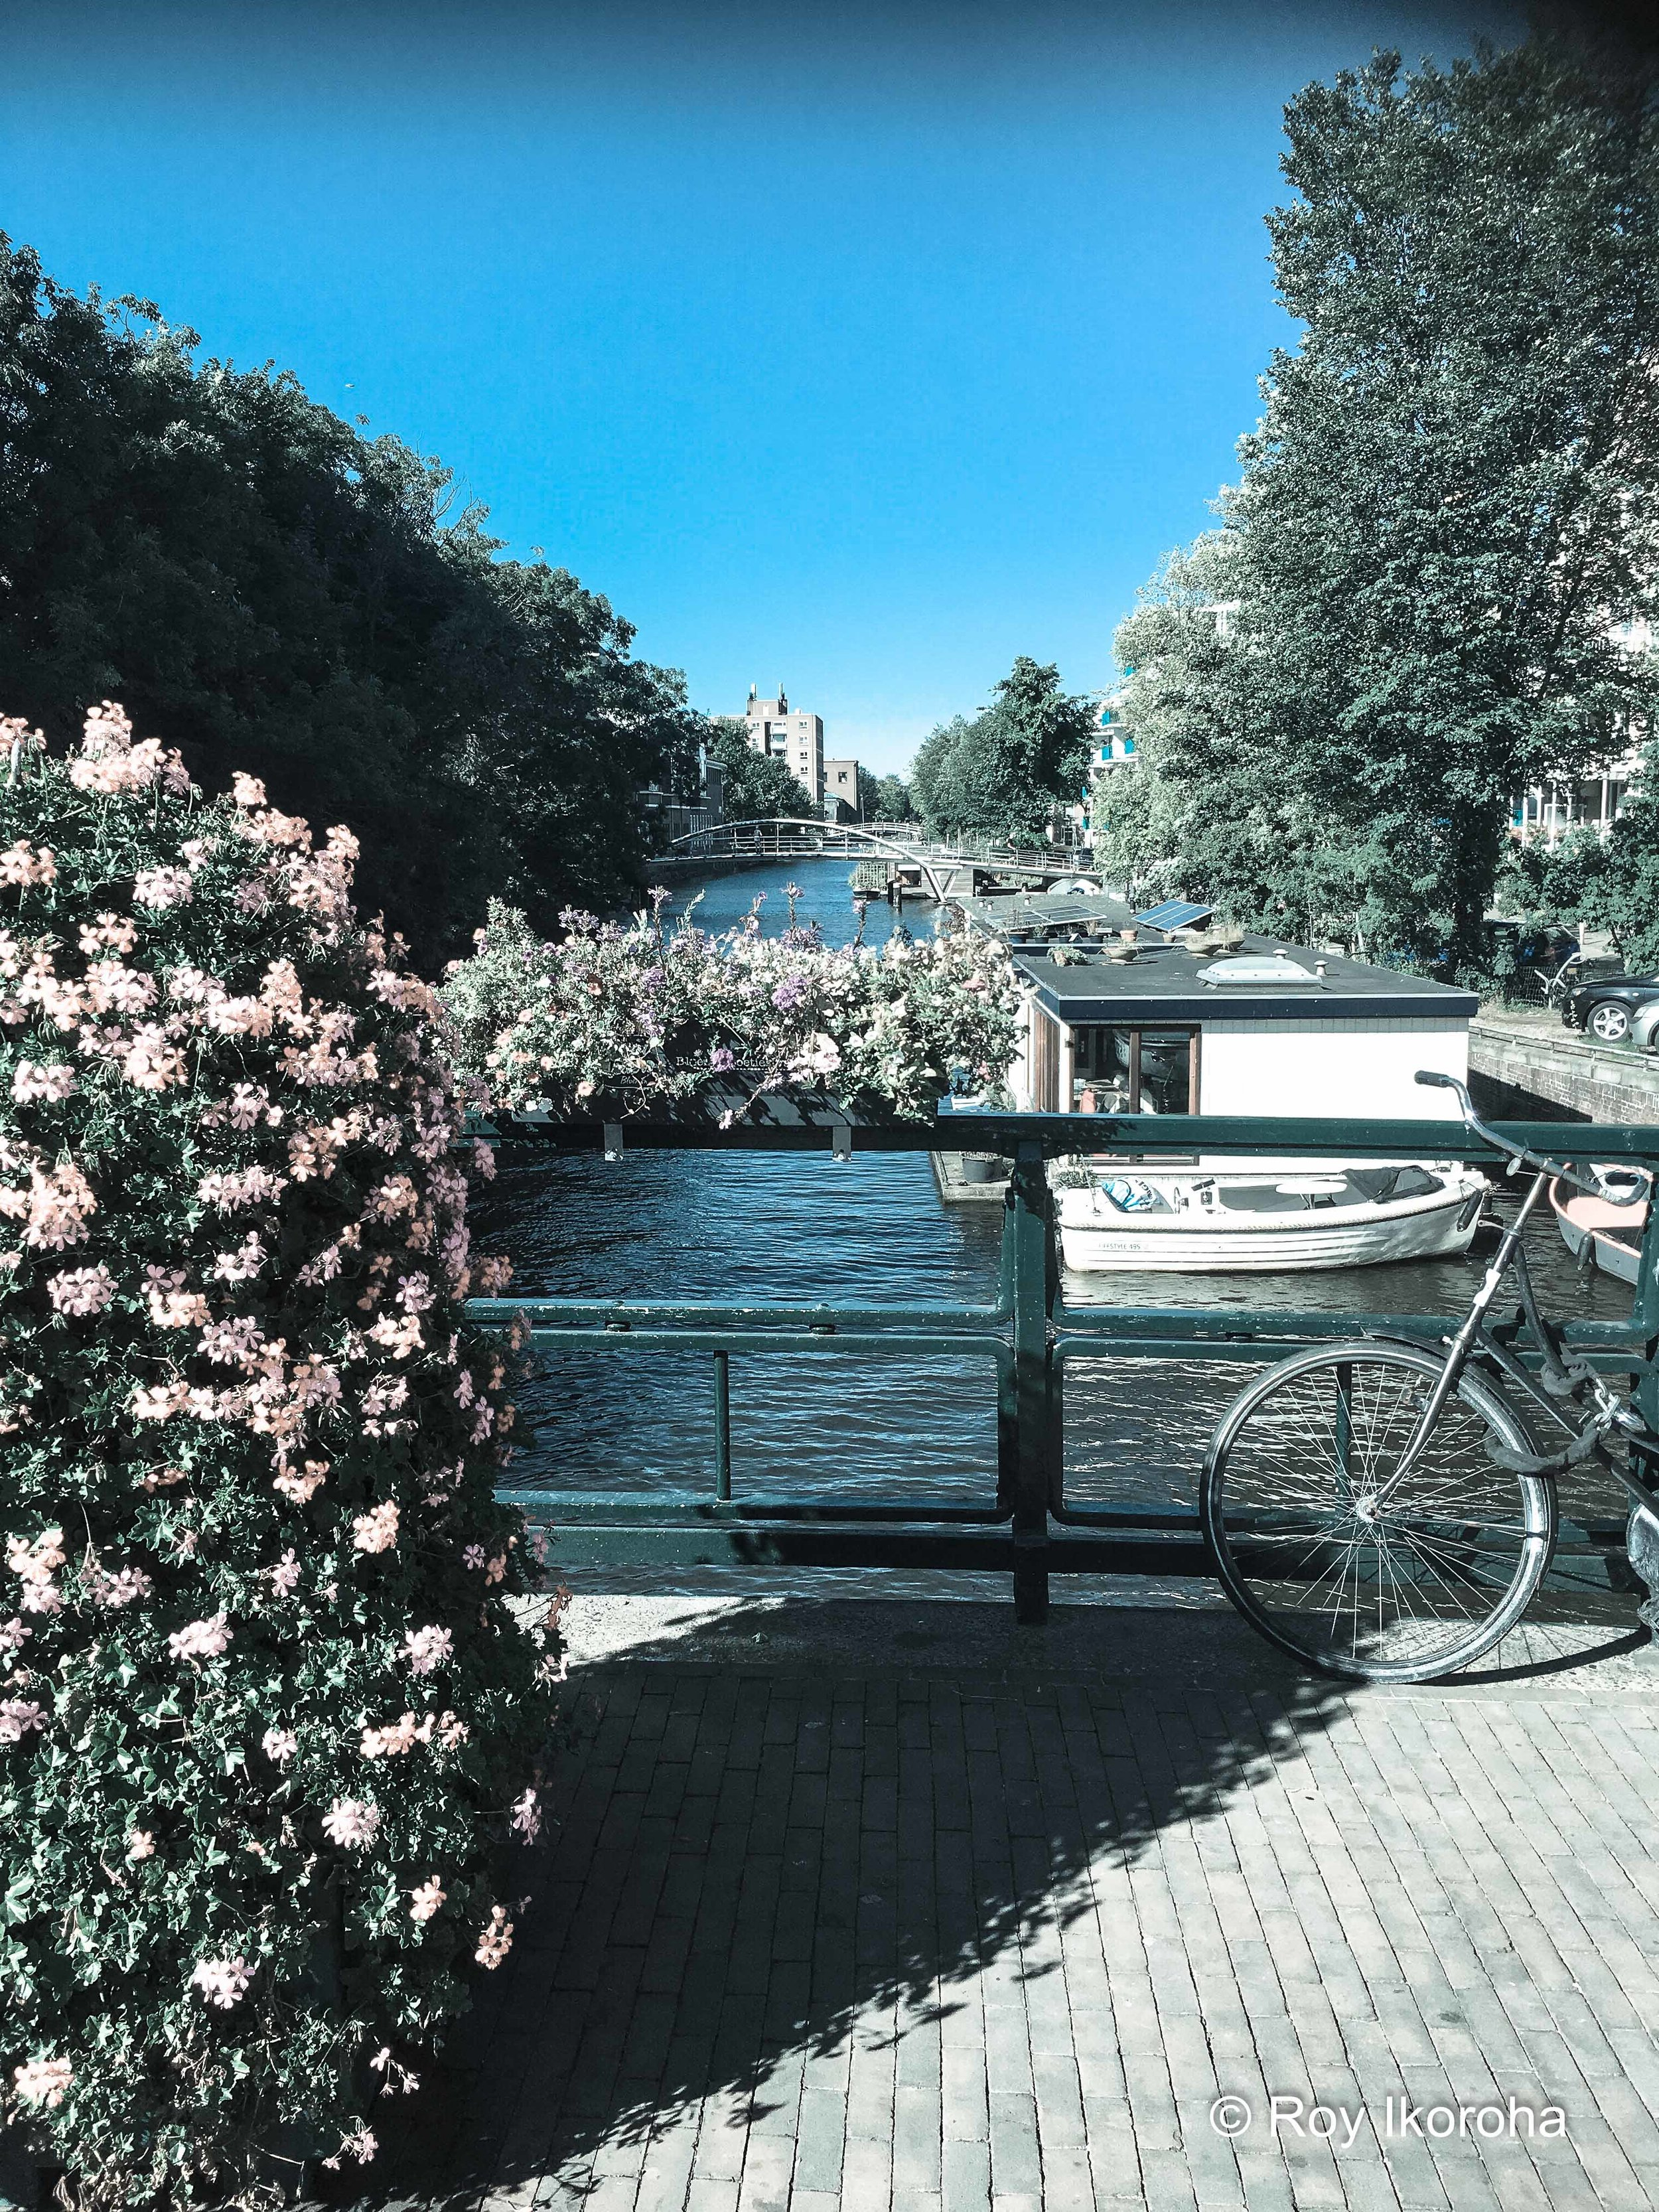 Some of the beautiful scenery on Bilderdijkstraat, Amsterdam, Netherlands